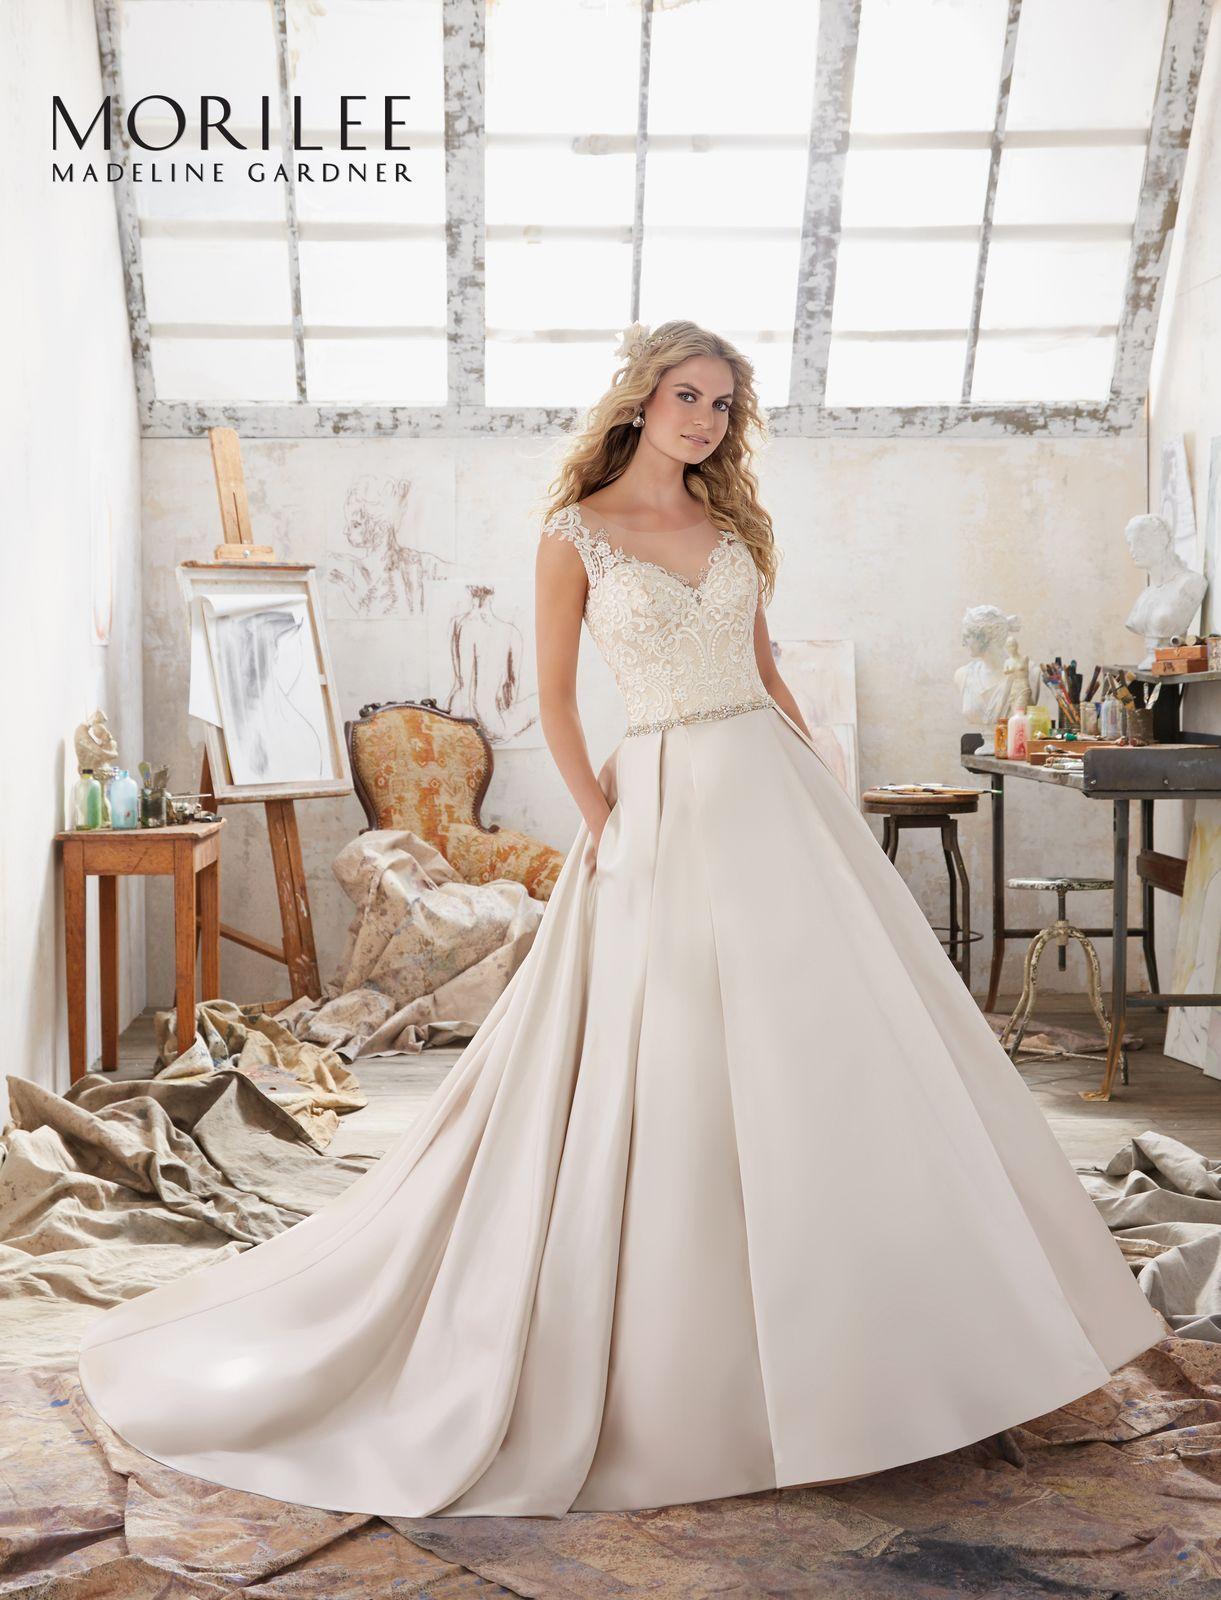 Poważne Elegancka suknia ślubna Mori Lee, koronkowy gorset i efektowna KE89